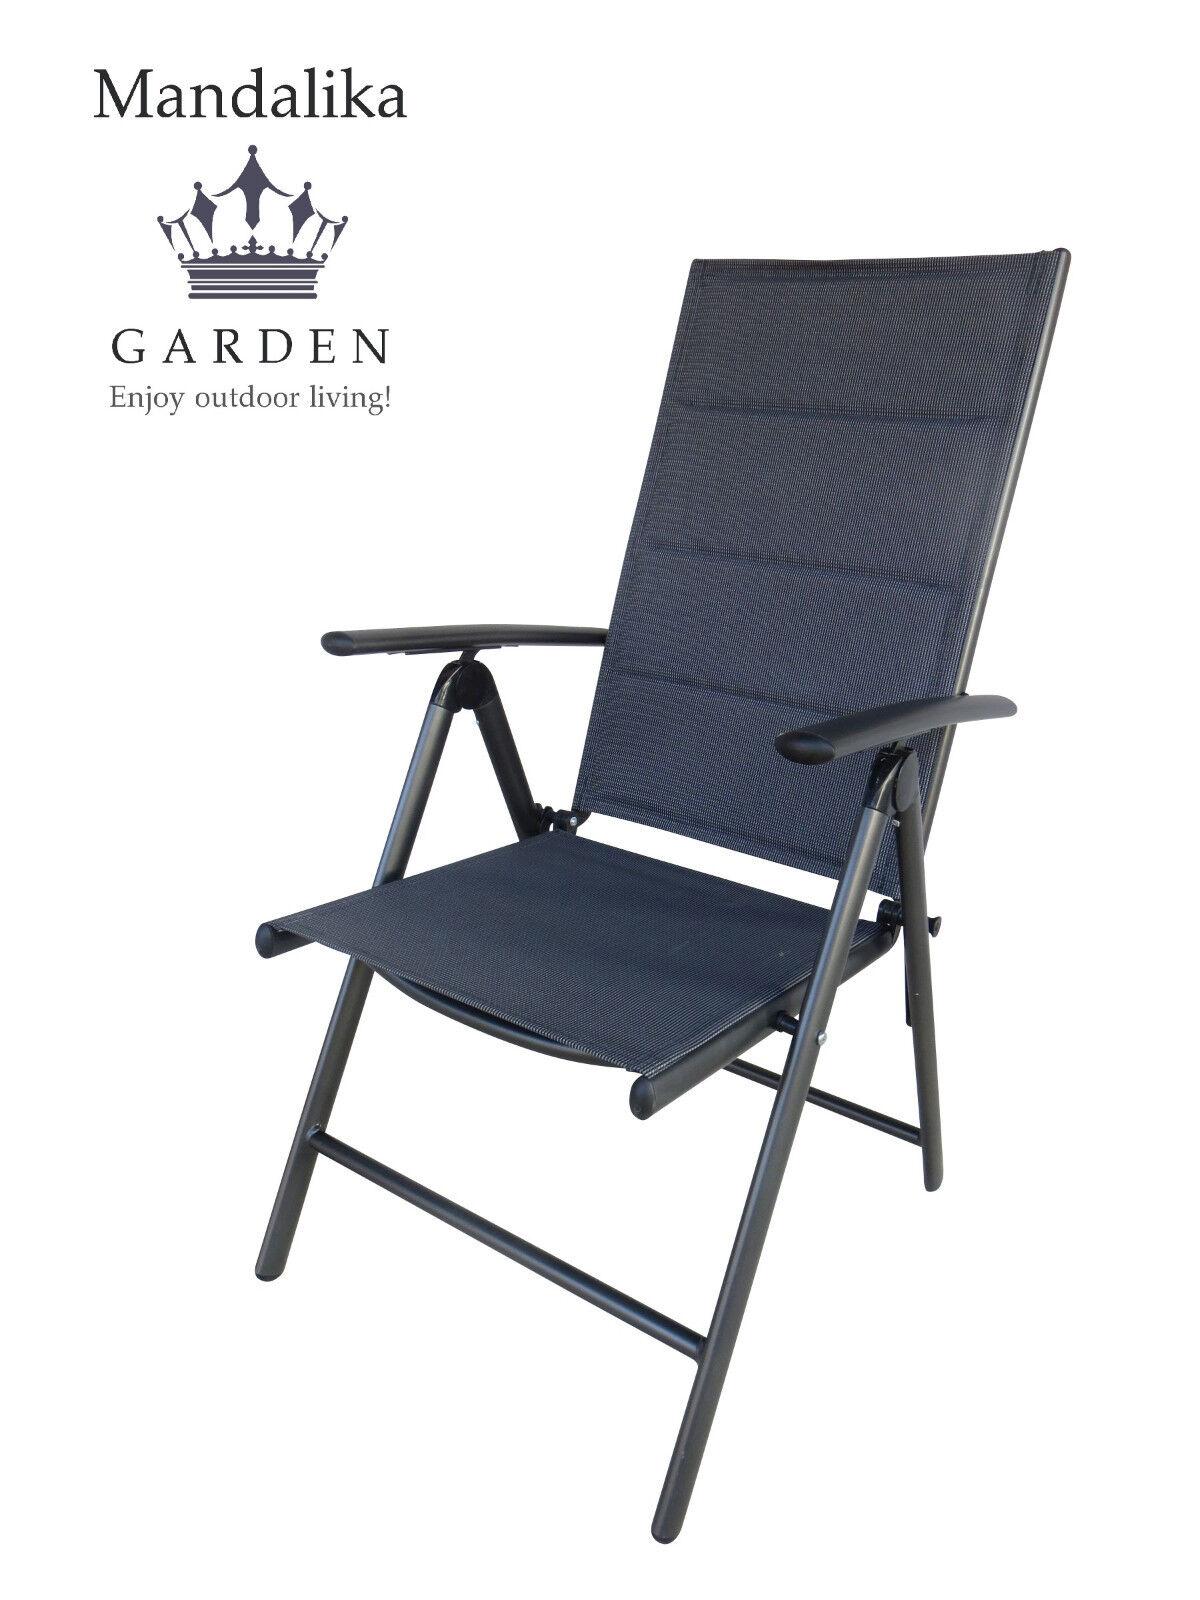 Mandalika plegable sillón bolero Mega Padded Alu silla plegable muebles de jardín silla de jardín